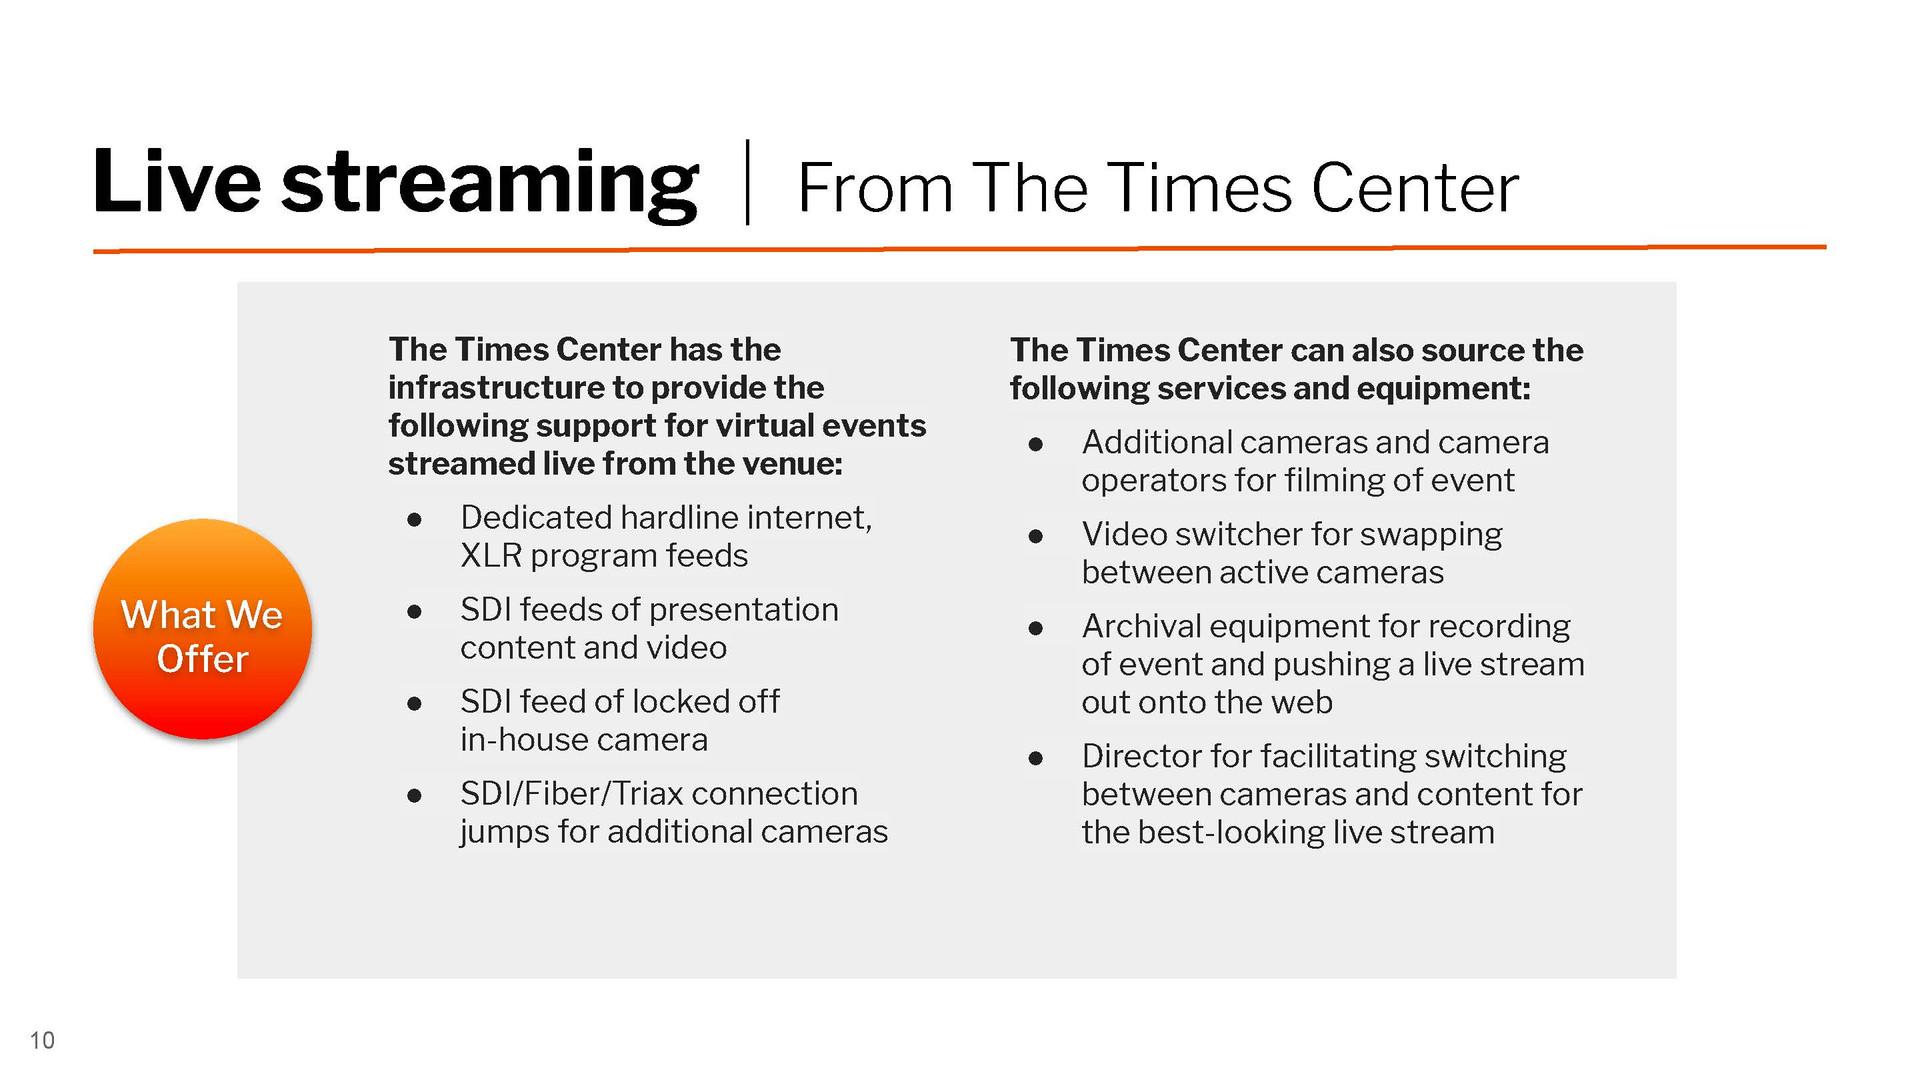 TheTimesCenter